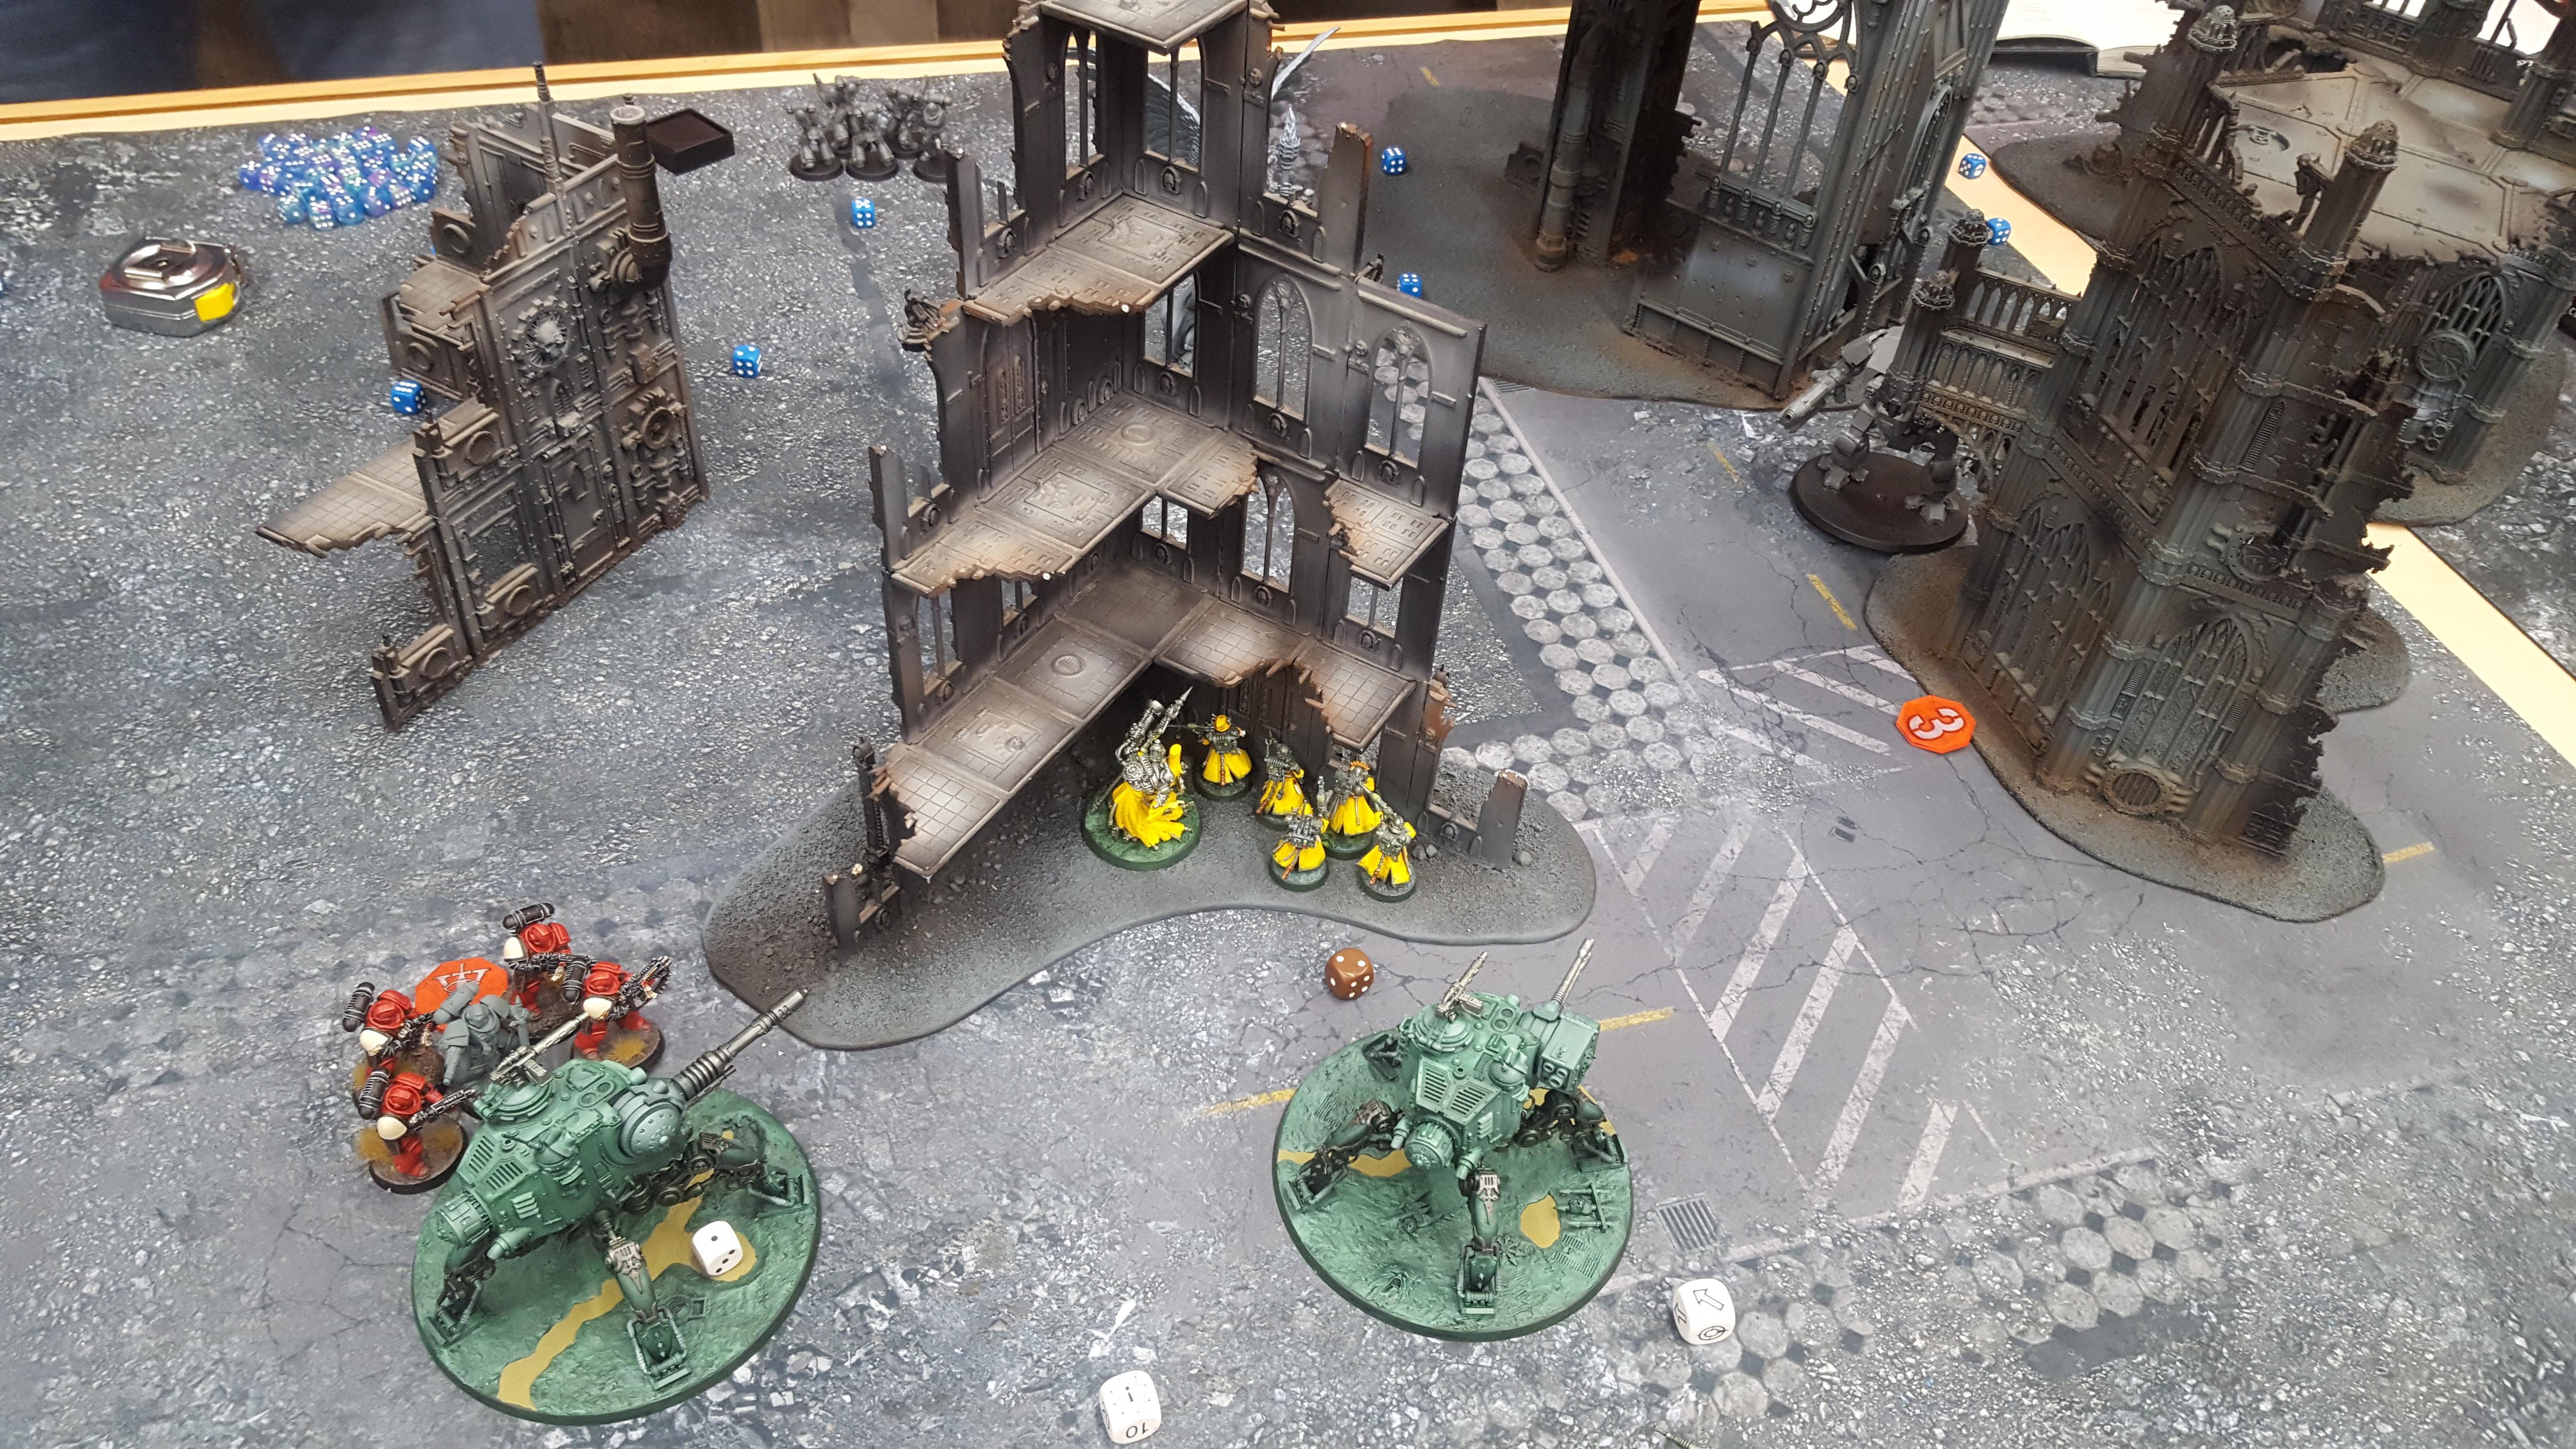 Battle Report, Dunecrawler, Intercessor, Mechanicus, Onager, Skitarii, Terrain, Vanguard